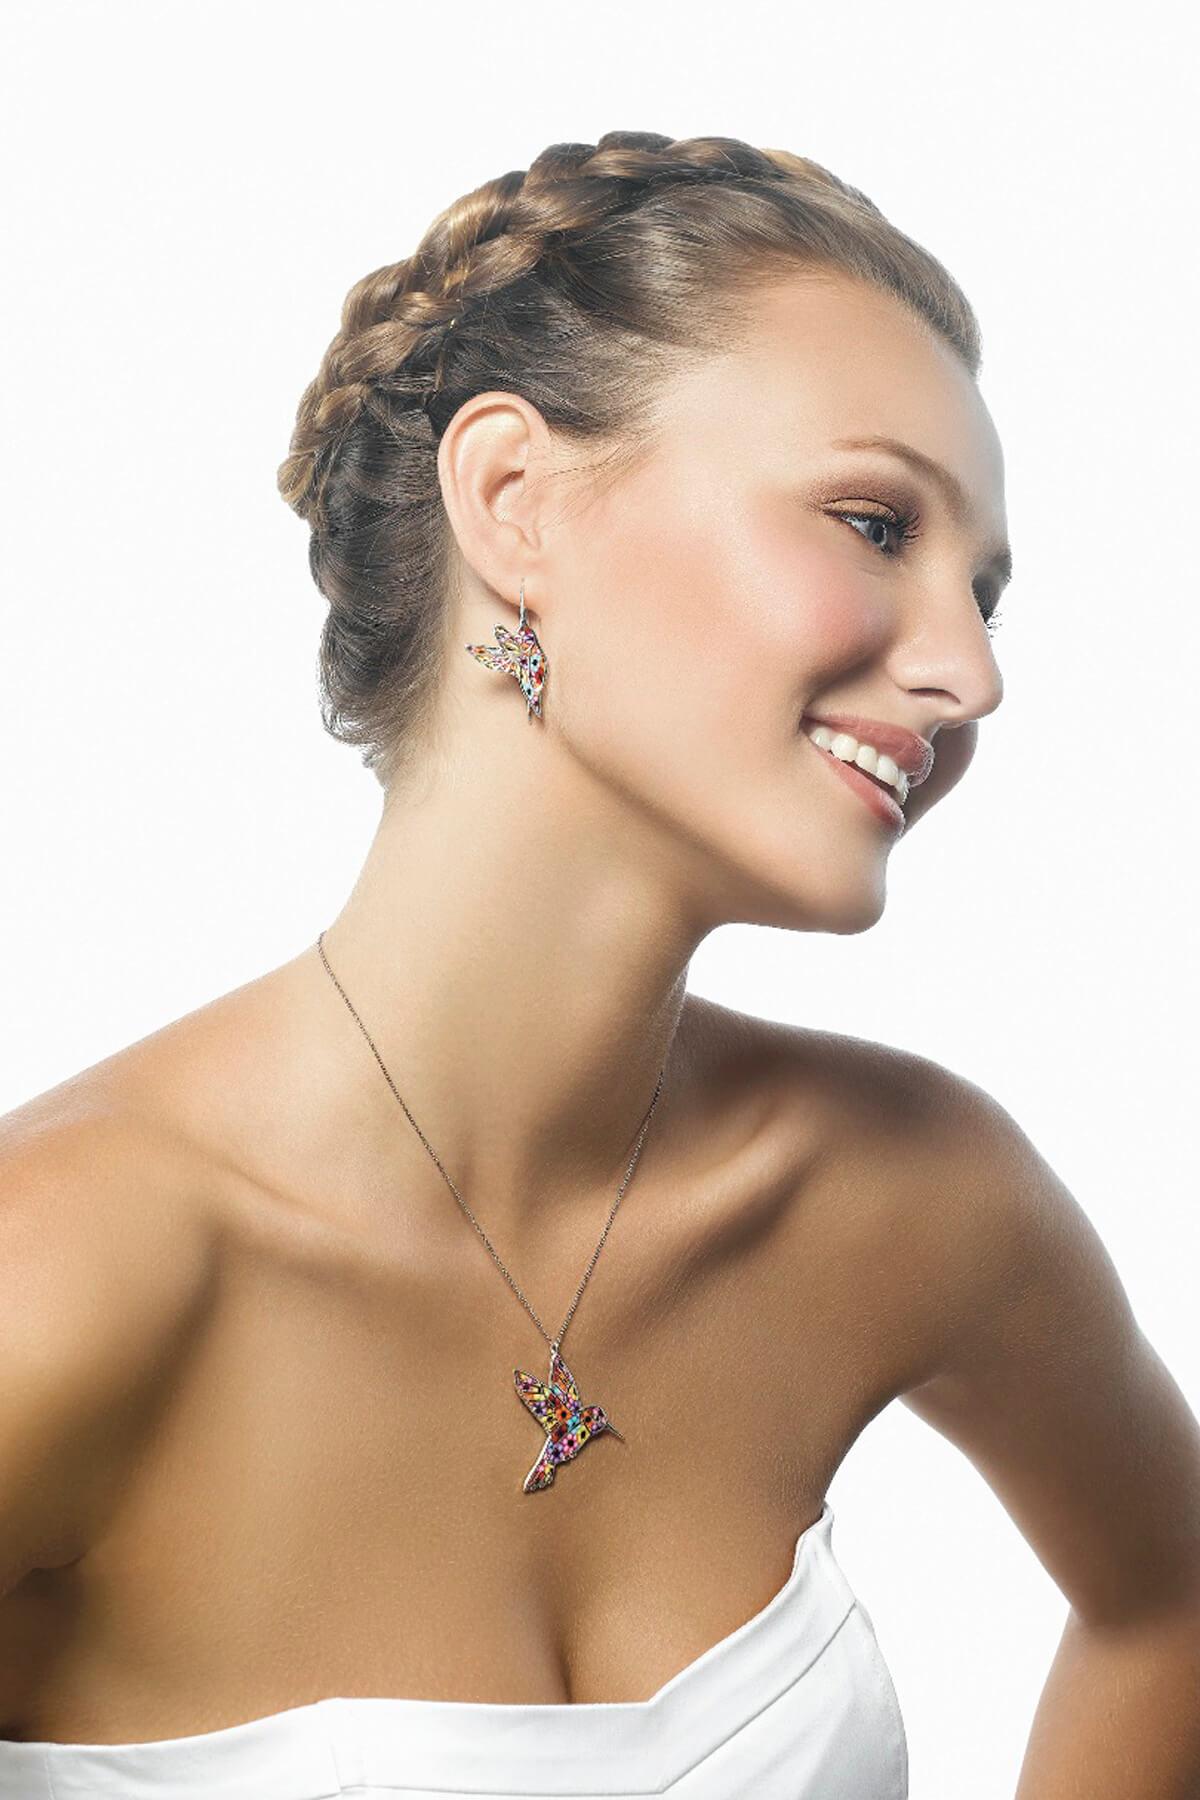 Handmade Silver Hummingbird Earrings and Necklace – Millefiori Pattern